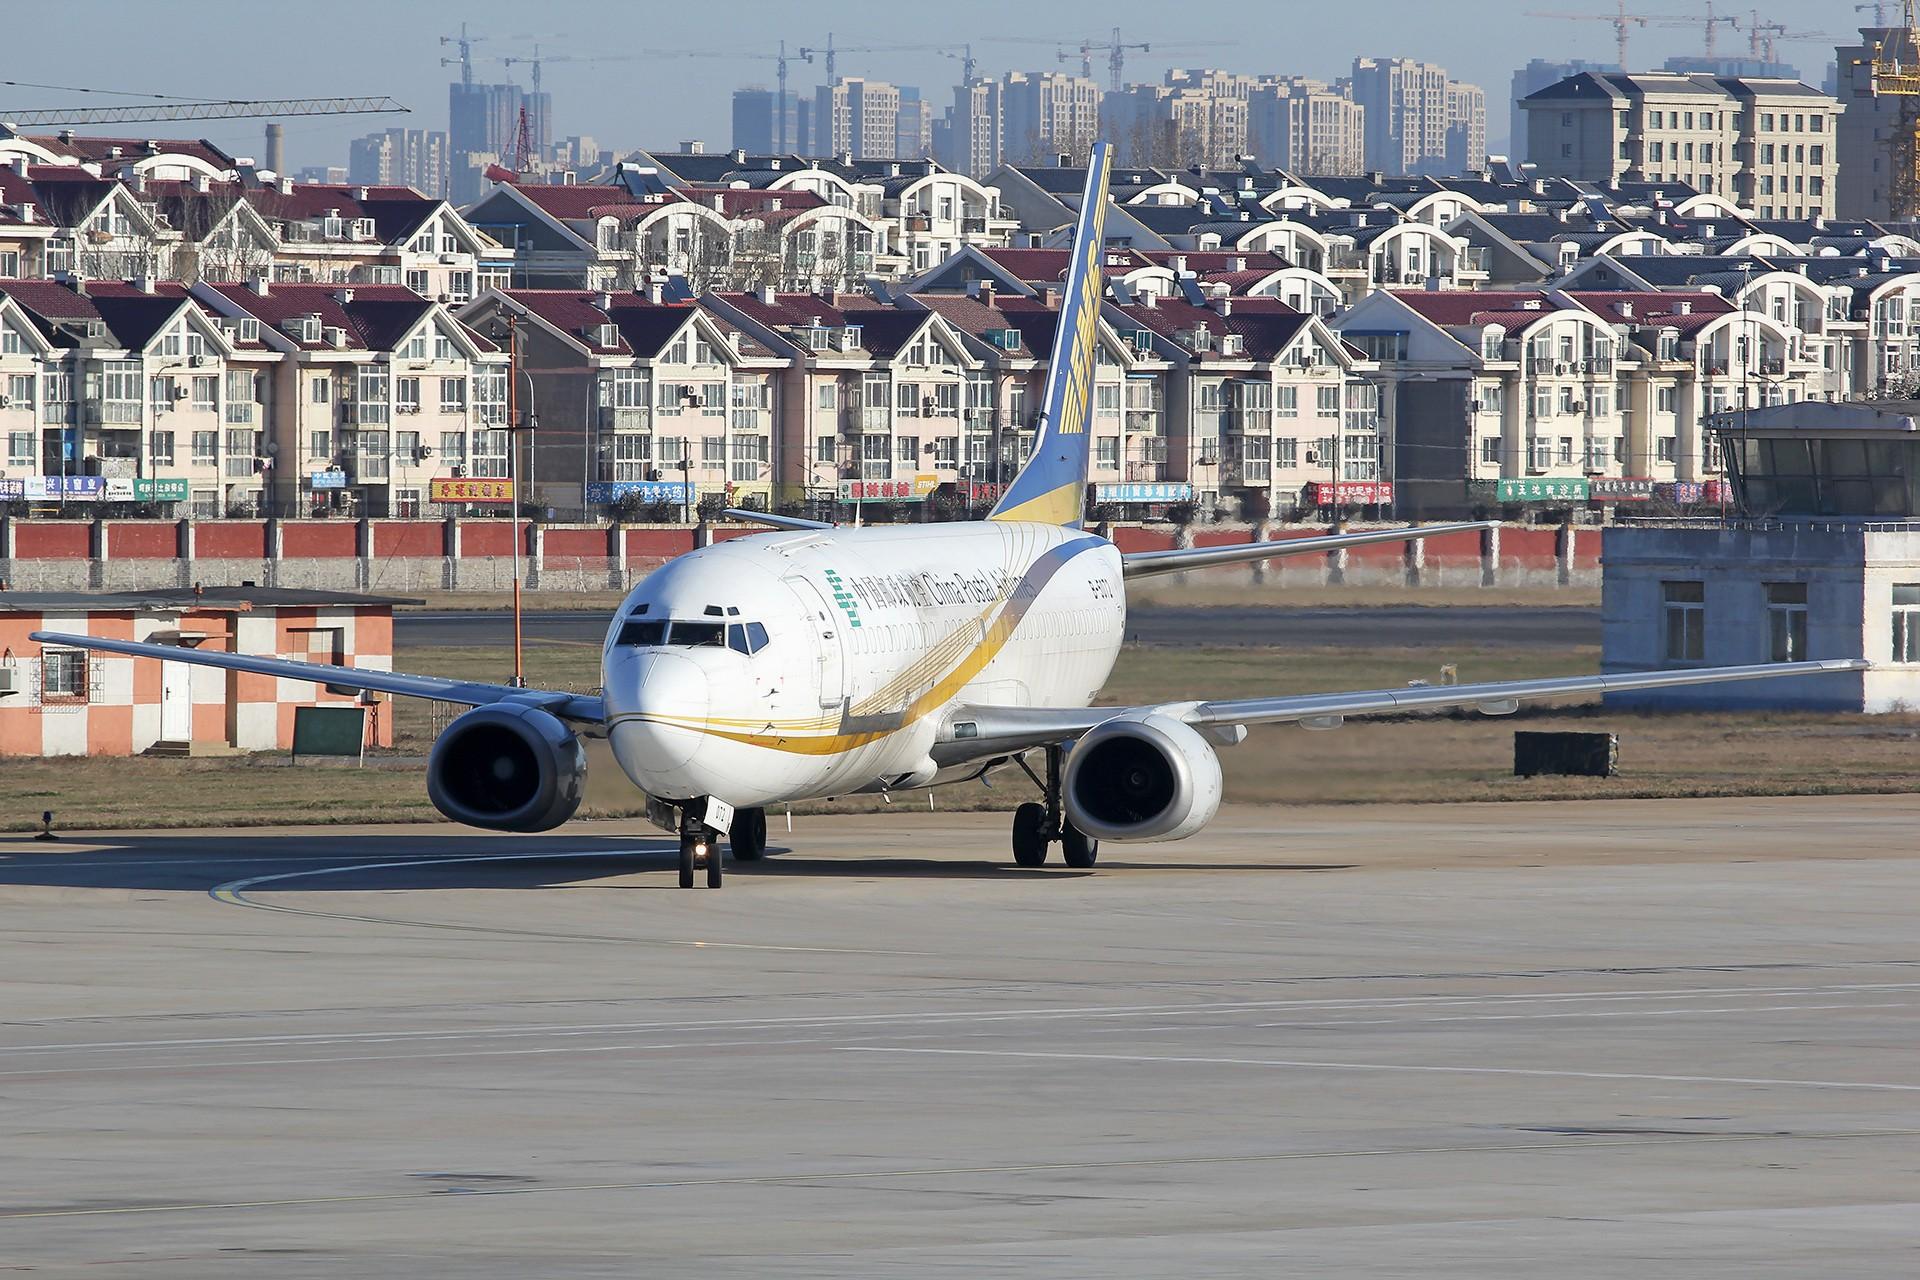 Re:[原创][DLC]。。。无标题,杂图。。。 BOEING 737-300 B-5072 中国大连国际机场